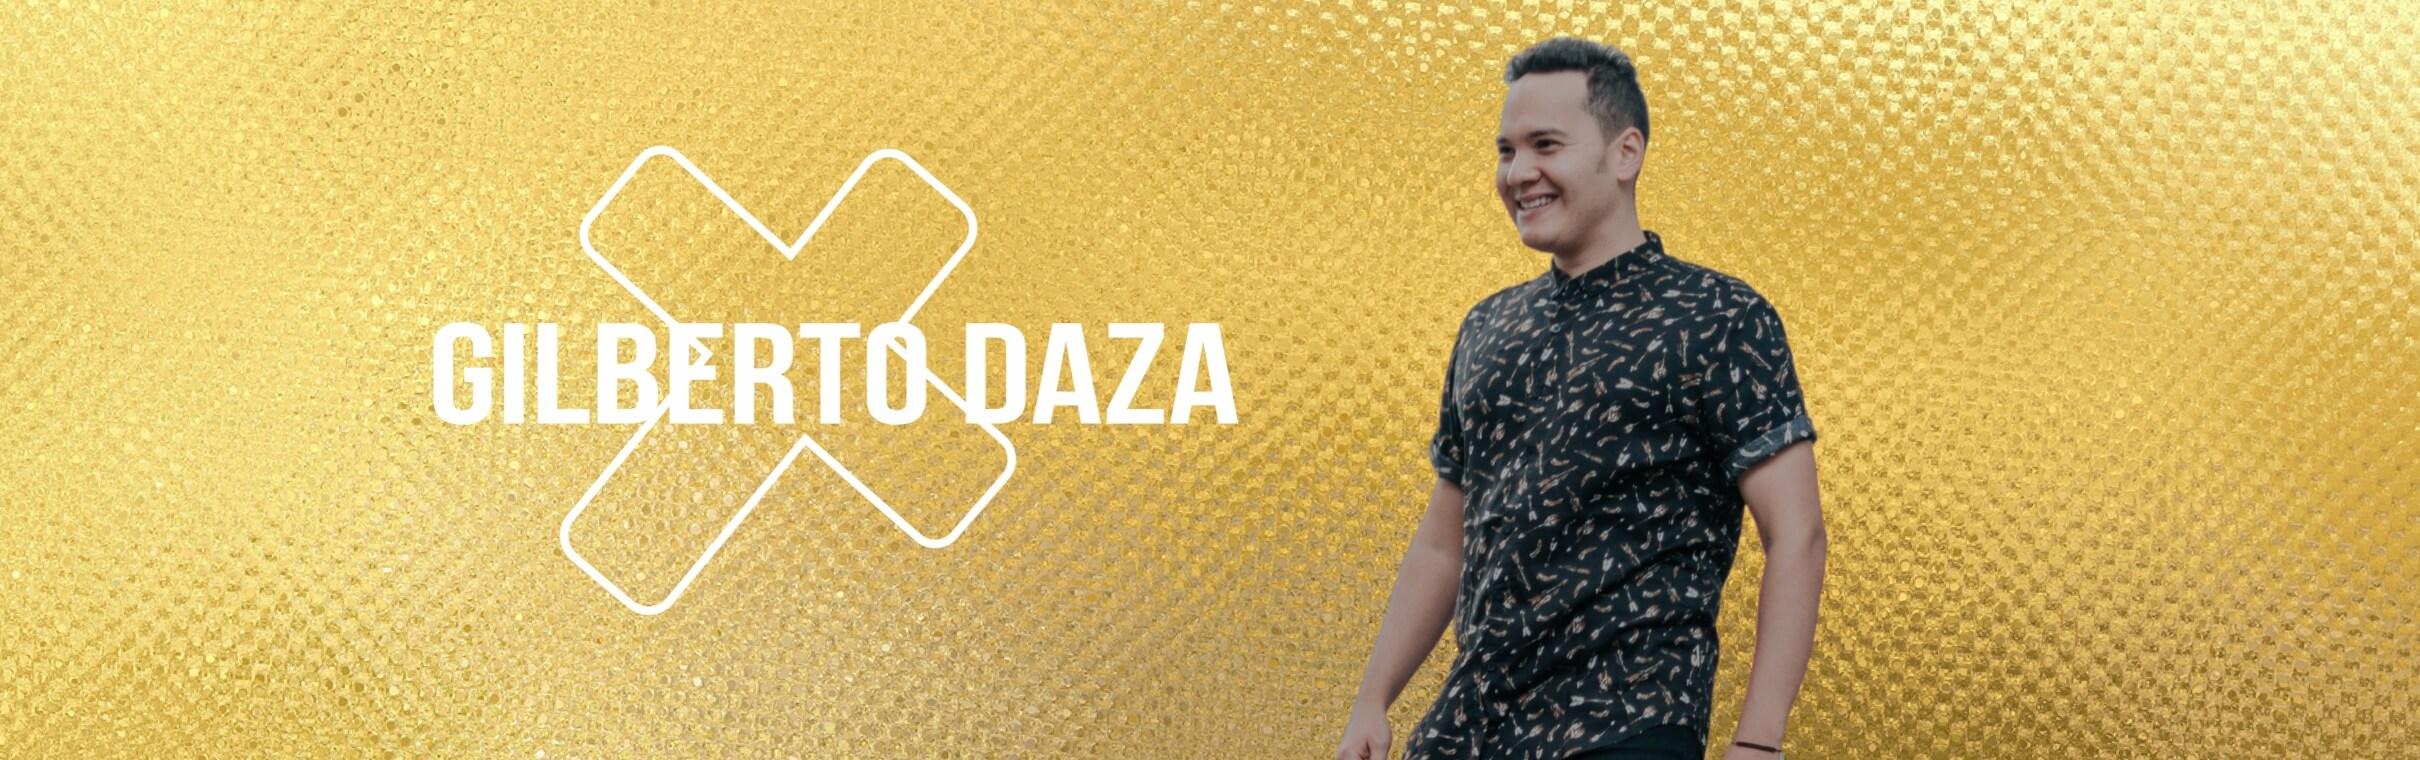 Gilberto Daza